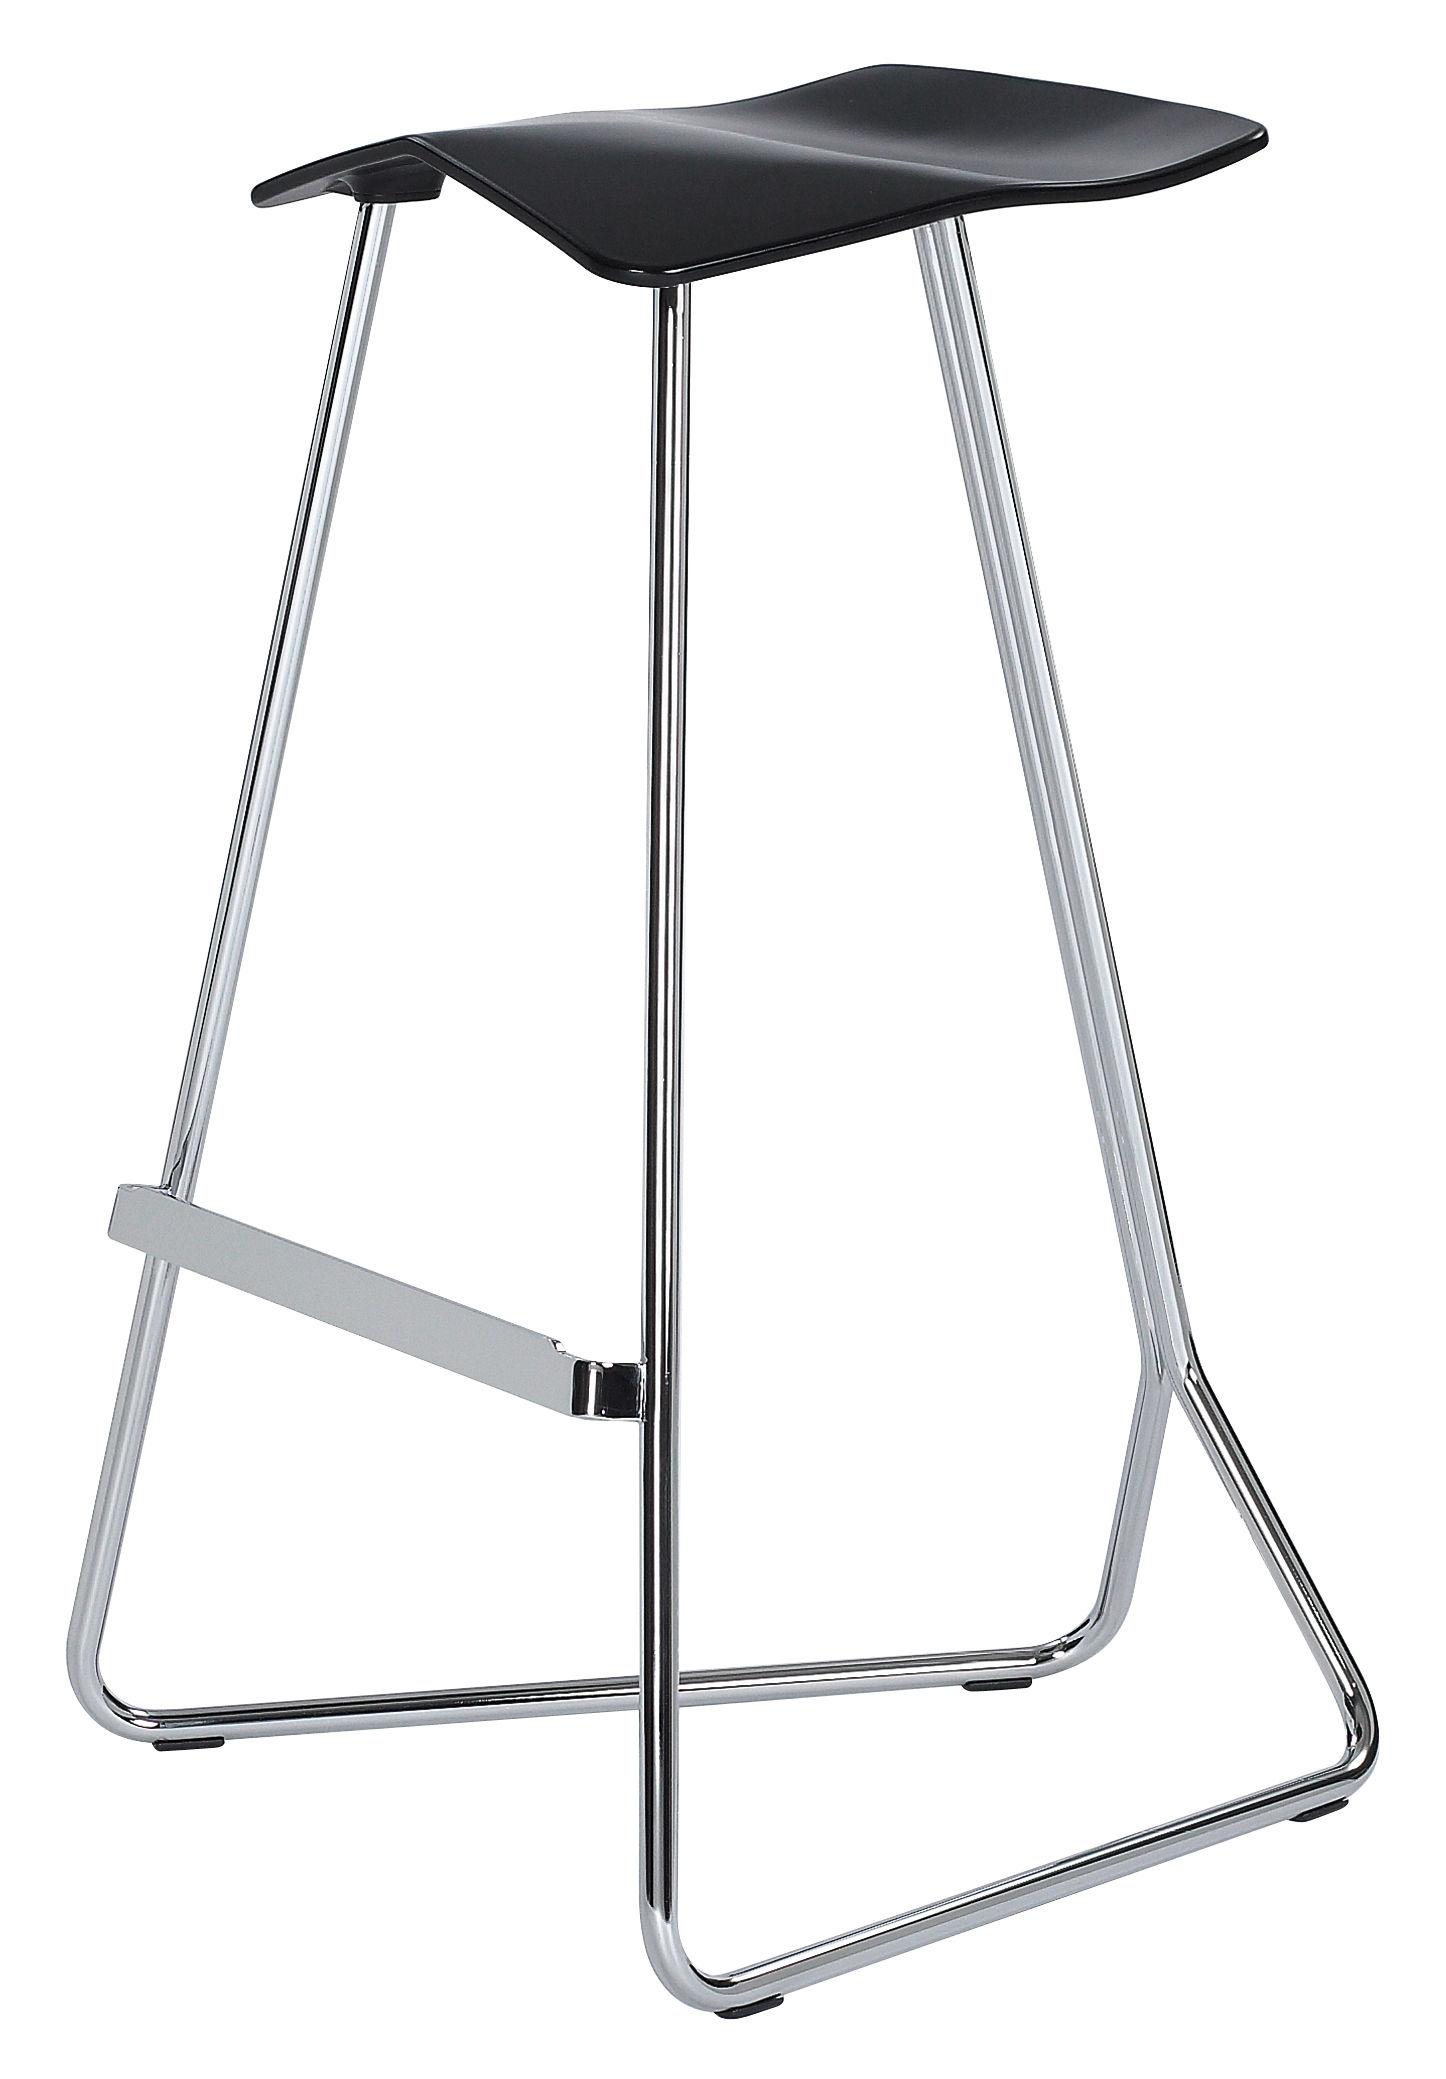 Möbel - Barhocker - Triton Barhocker - ClassiCon - Schwarz - Gestell verchromt - Polyurhethan, verchromter Stahl